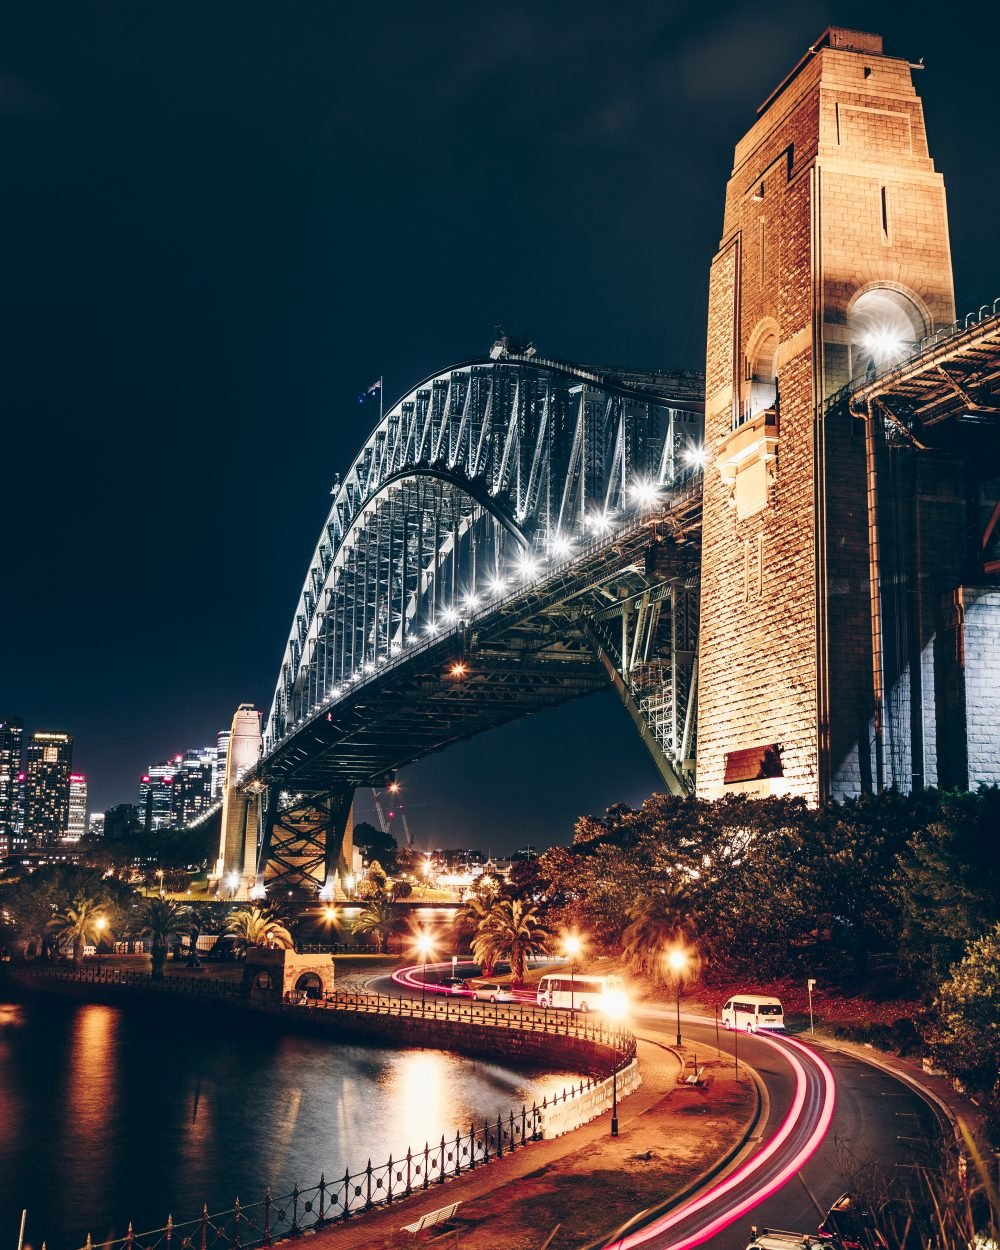 Australia's Civil Infrastructure Boom Set to Continue Into 2020